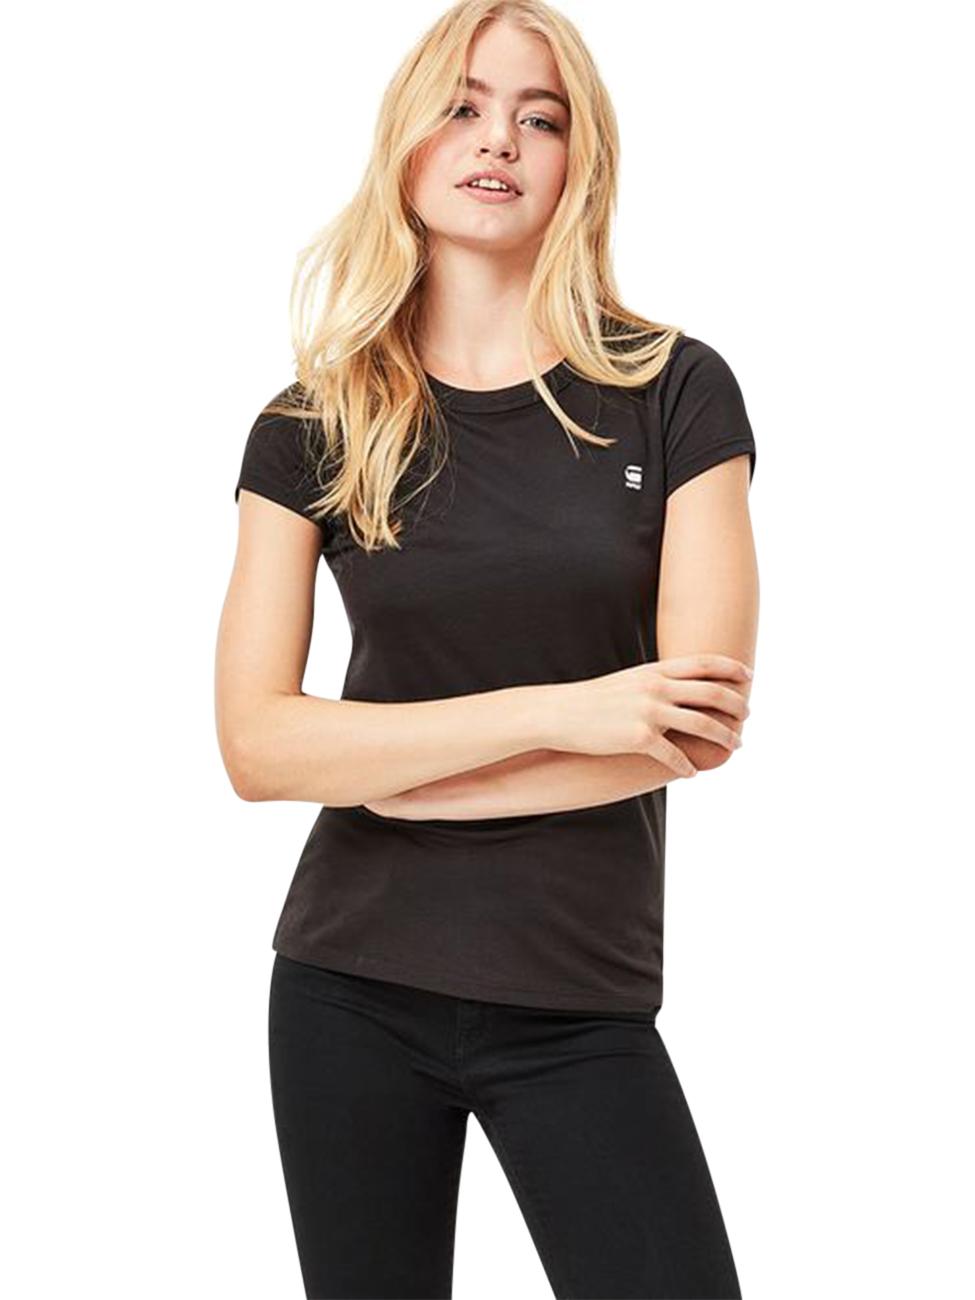 g star damen t shirt eyben slim fit kaufen jeans direct de. Black Bedroom Furniture Sets. Home Design Ideas